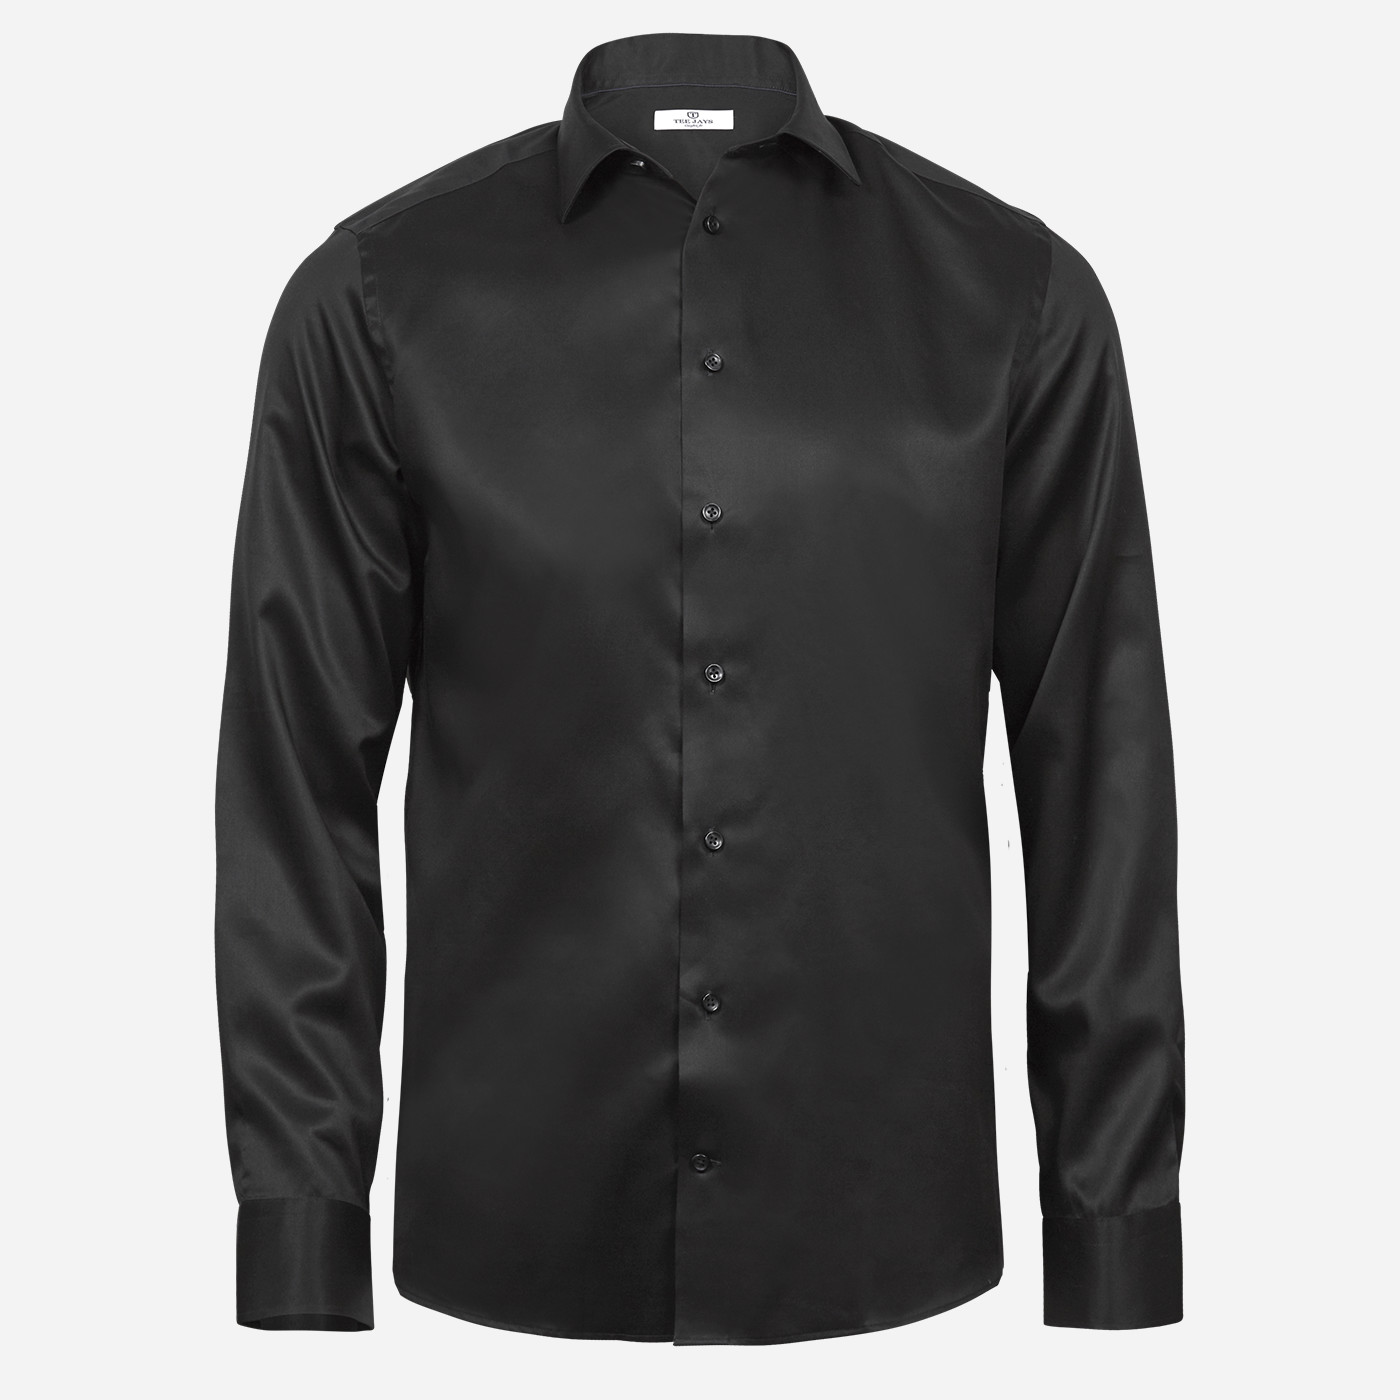 Čierna košeľa Tee Jays, 2-ply, Regular fit Veľkosť: XXL 45/46